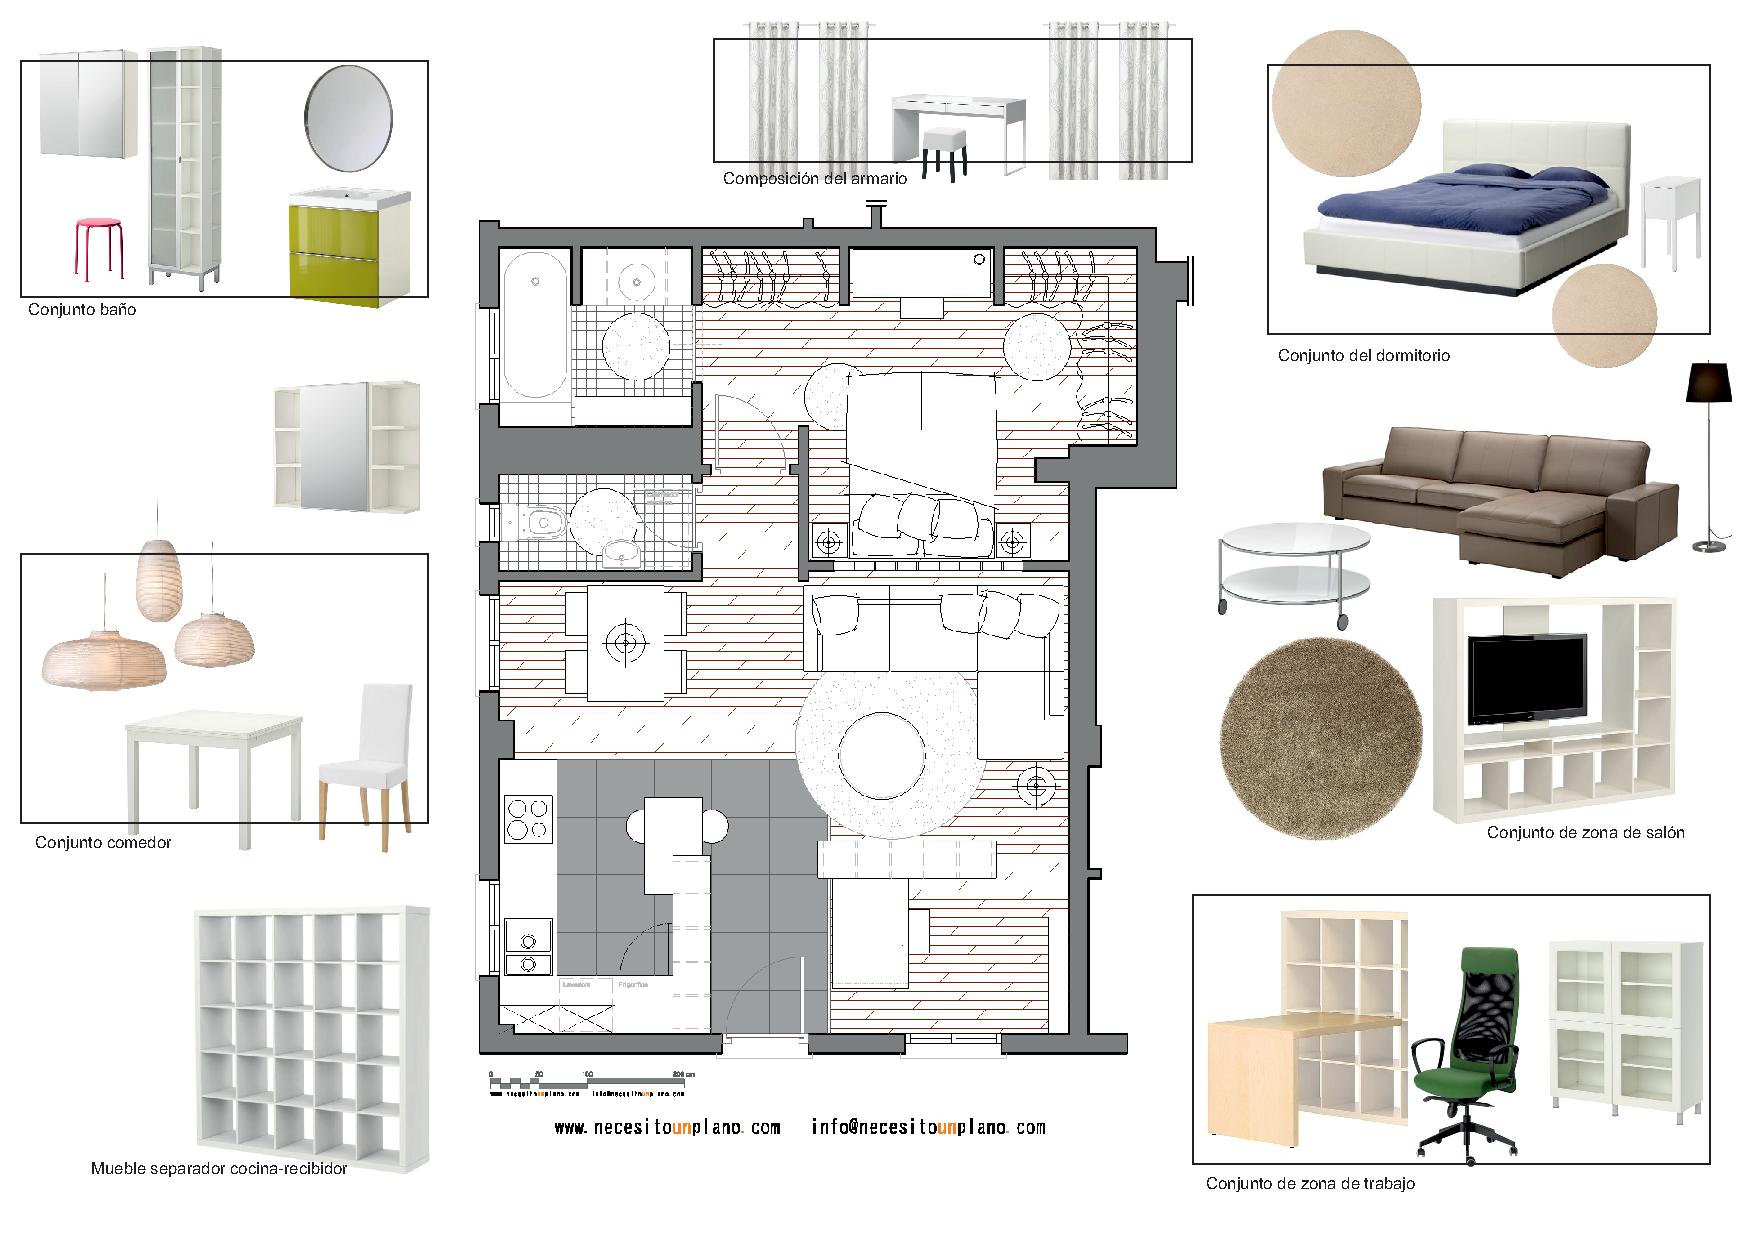 Int planta 1754 1240 detalle for Mobiliario para planos